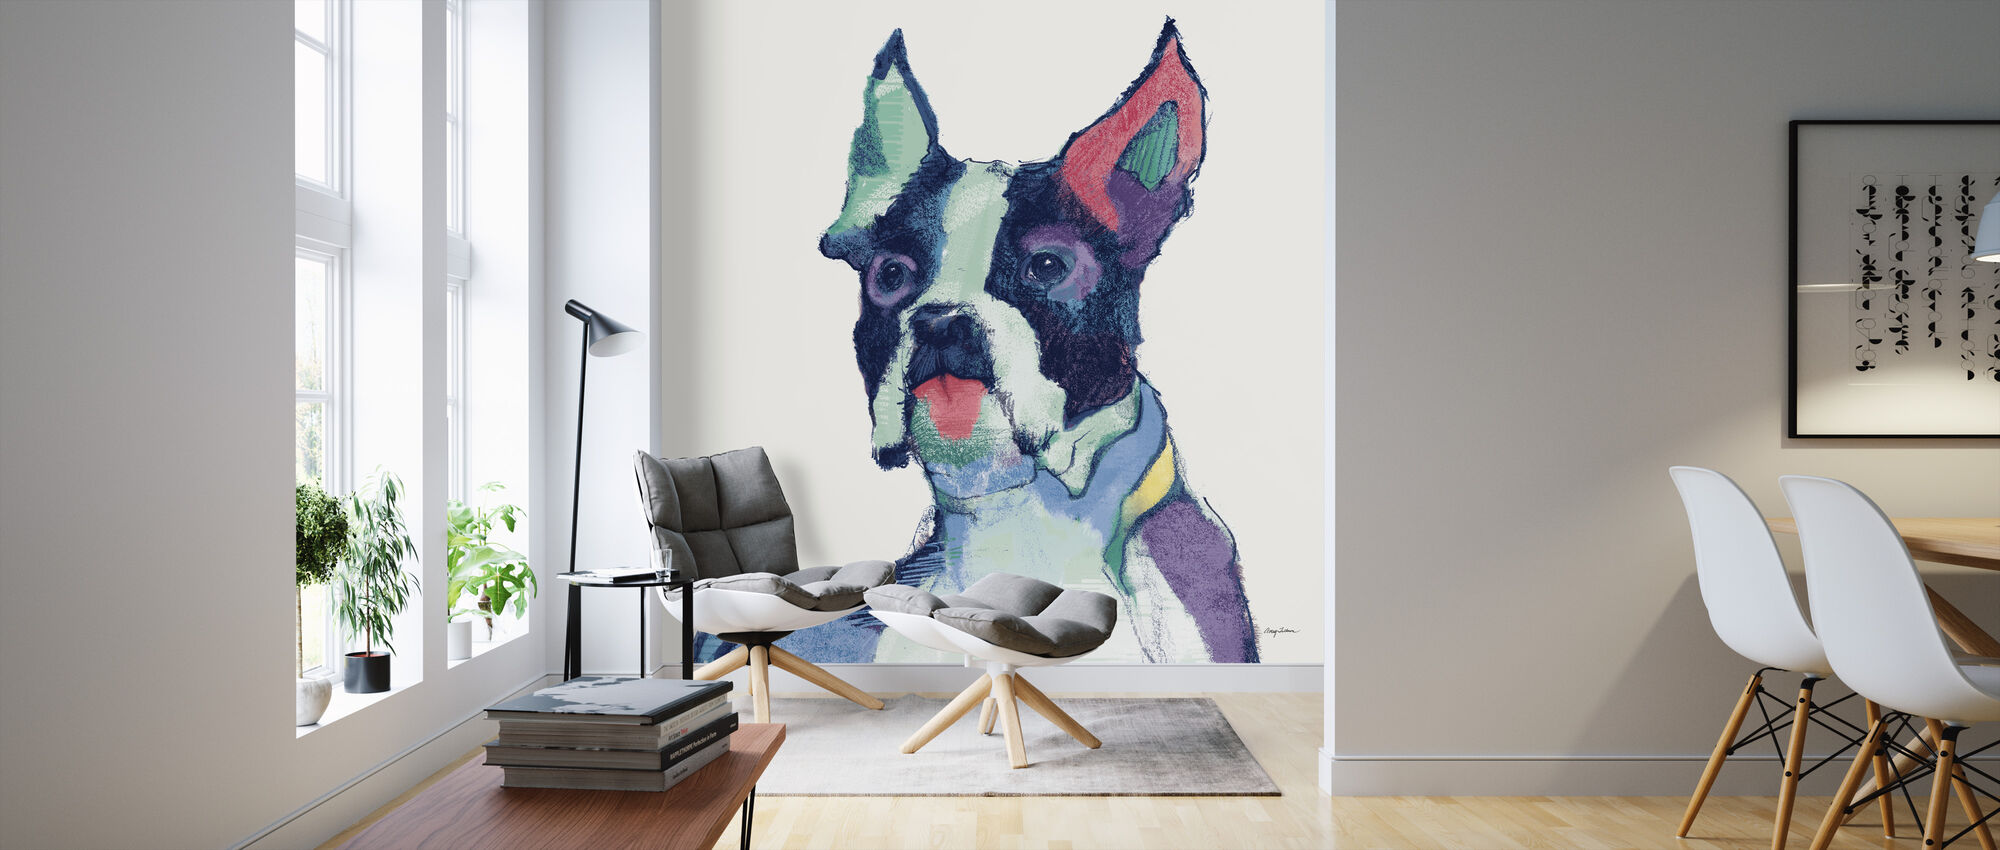 Ulysses Akvarel Pastel - Tapet - Stue